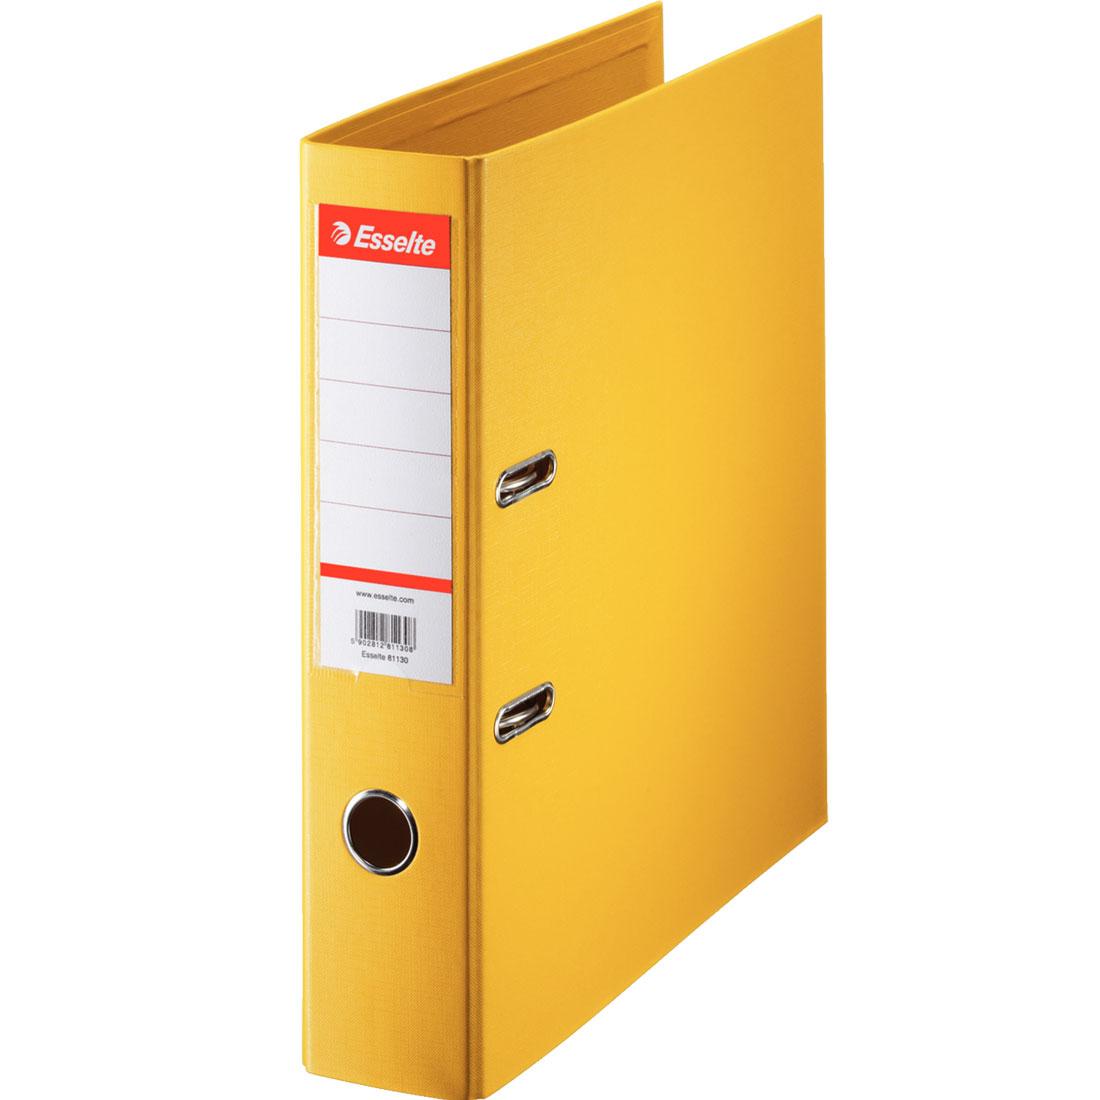 classeur esselte classeur a levier standard 75mm jaune classeur a levier standard 2 anneaux dos 75